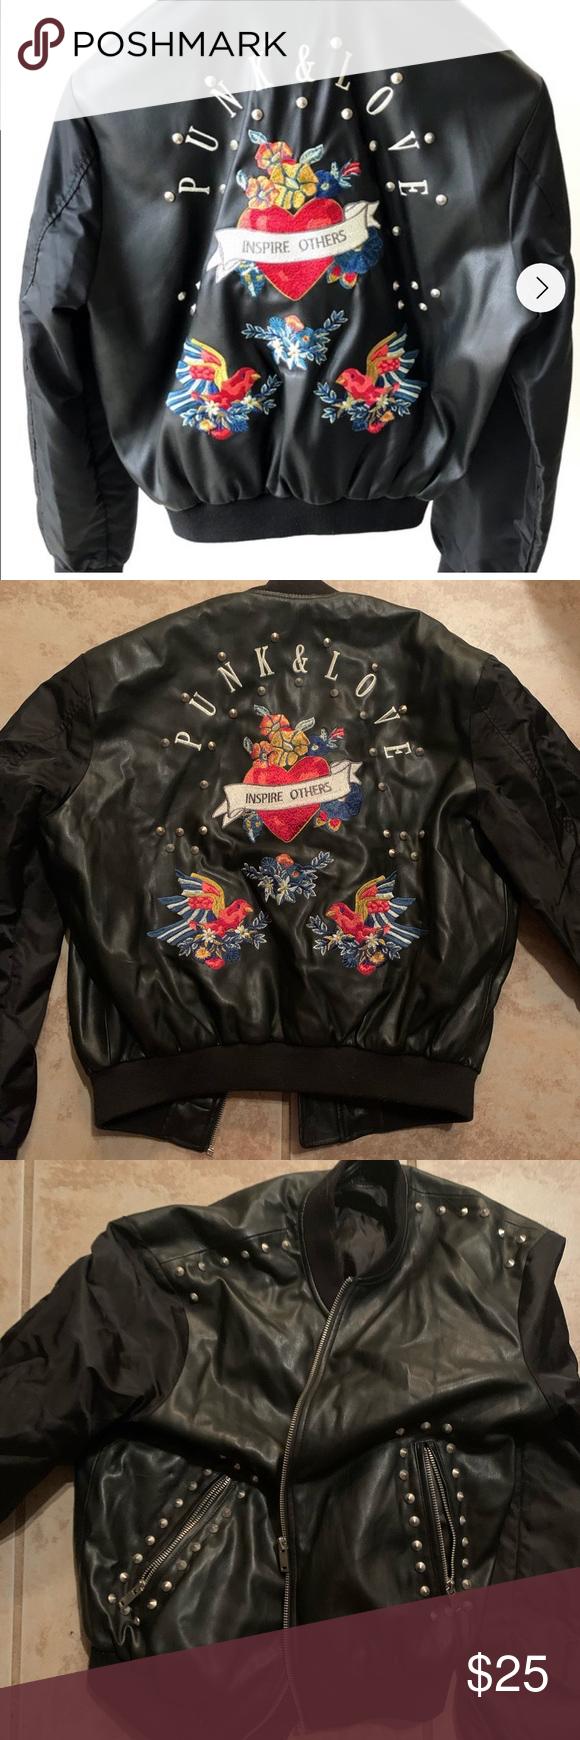 Zara Punk And Love Leather Bomber Jacket Leather Bomber Jacket Leather Bomber Bomber Jacket [ 1740 x 580 Pixel ]